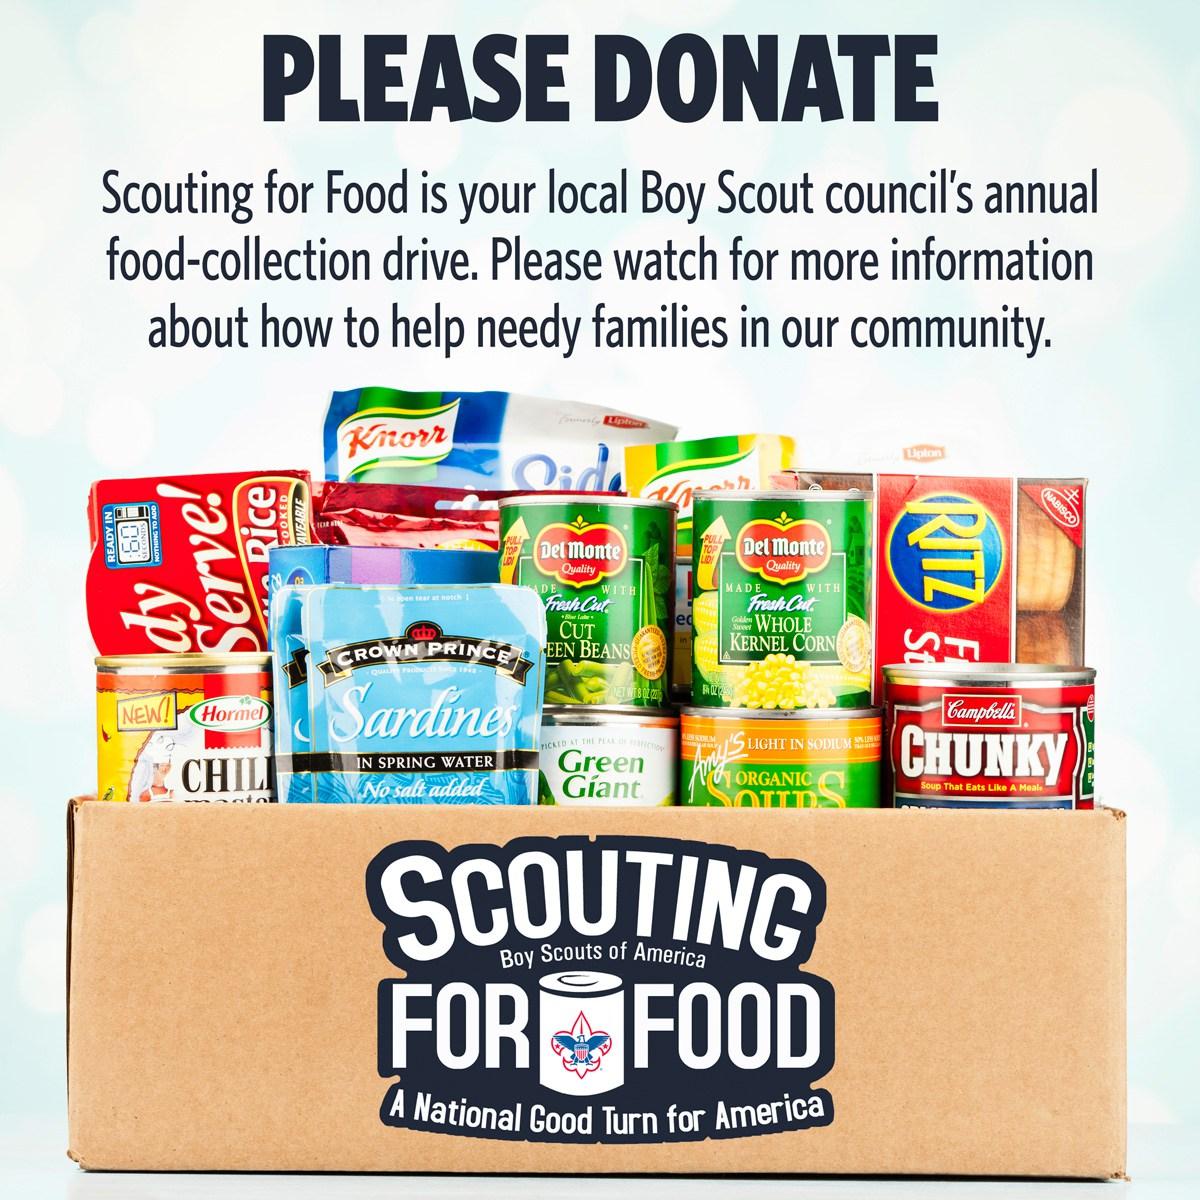 Scouting-for-Food-Facebook-1.jpg